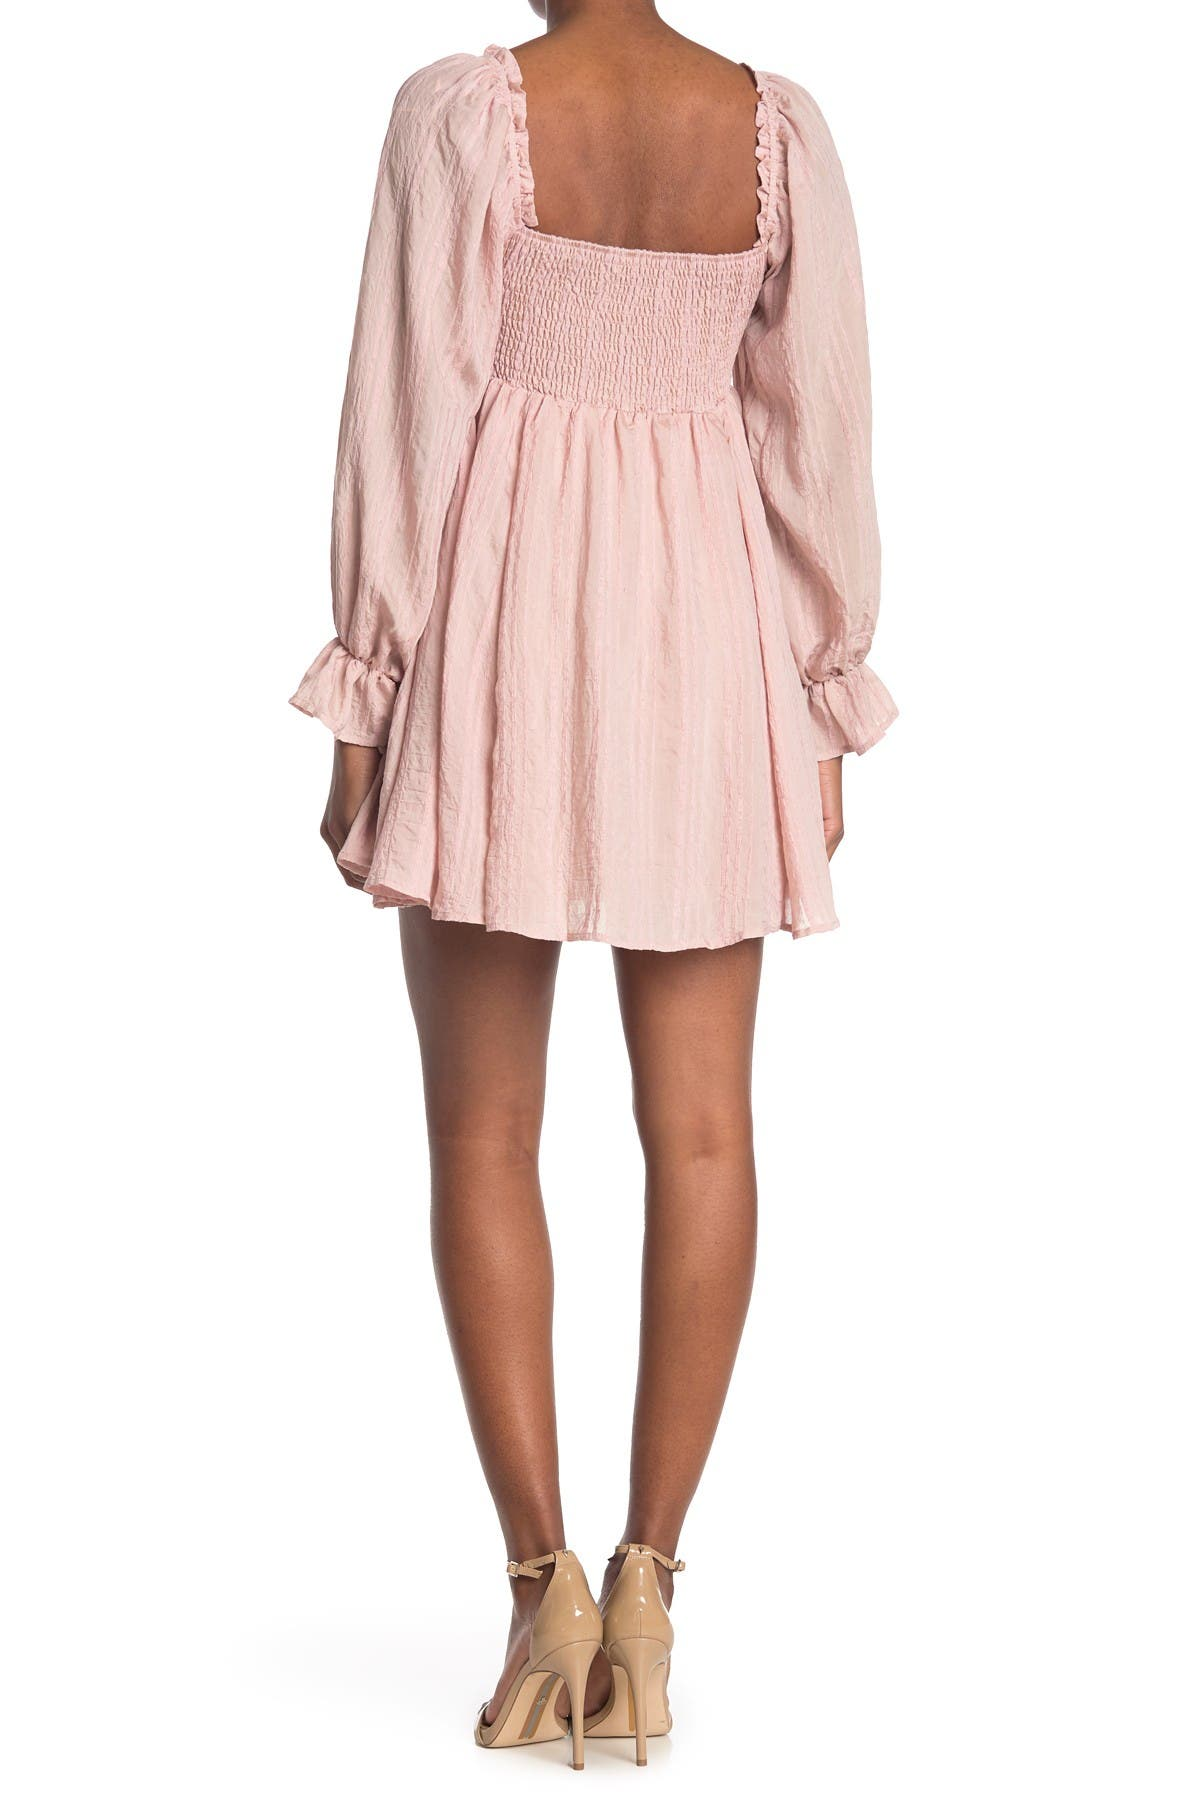 Image of A.Calin Solid Mini Dress